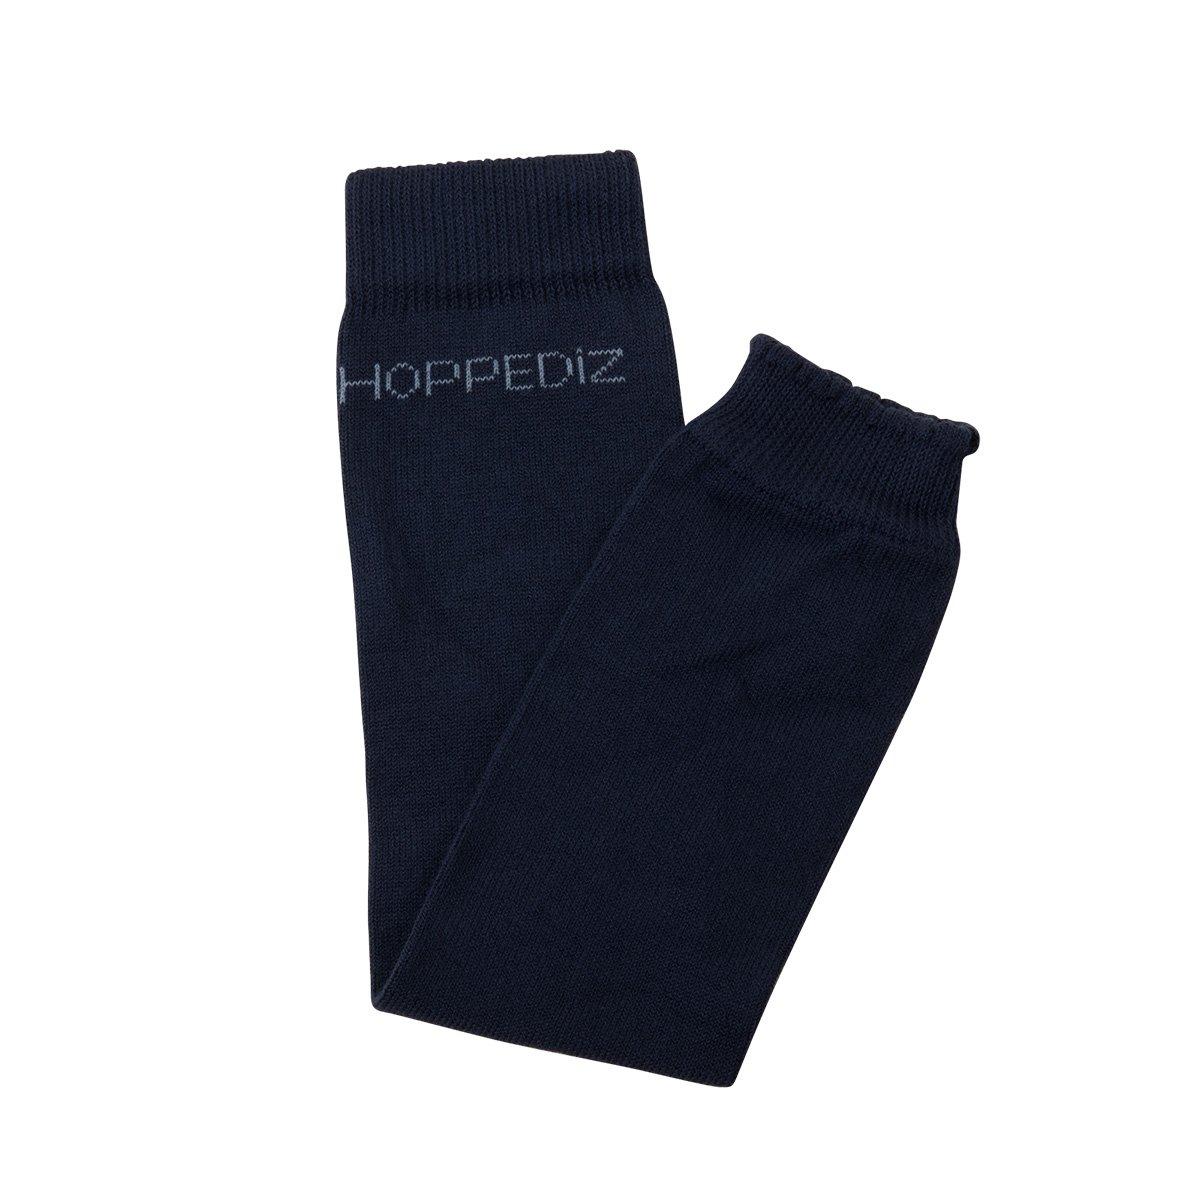 Hoppediz beb/é org/ánico del algod/ón calentadores de la pierna crema